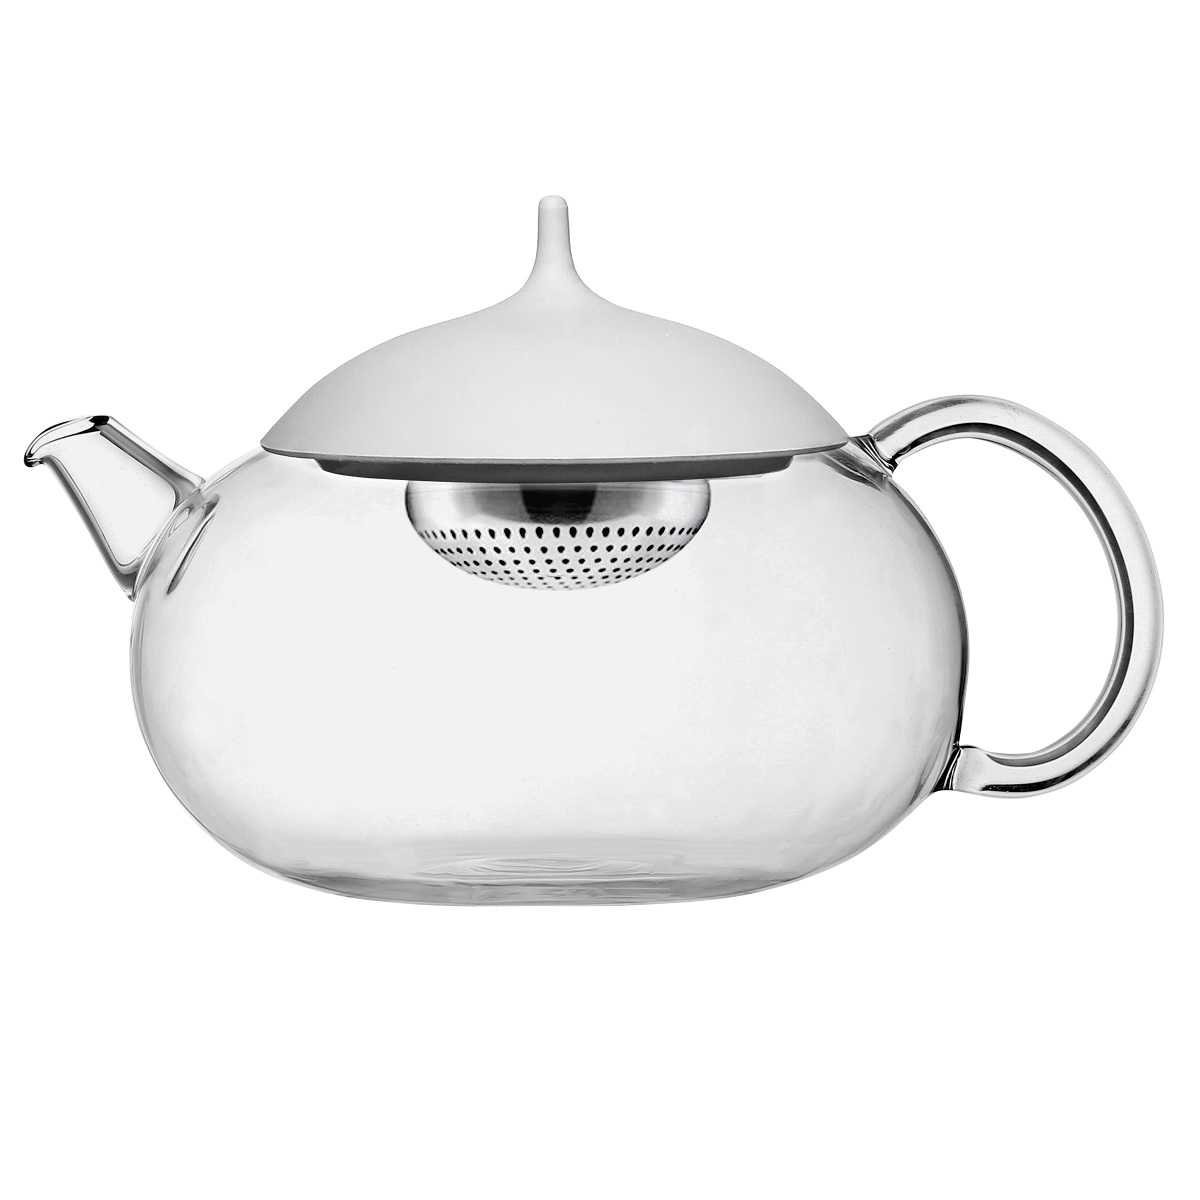 все цены на Чайник заварочный Folke TER109/B онлайн